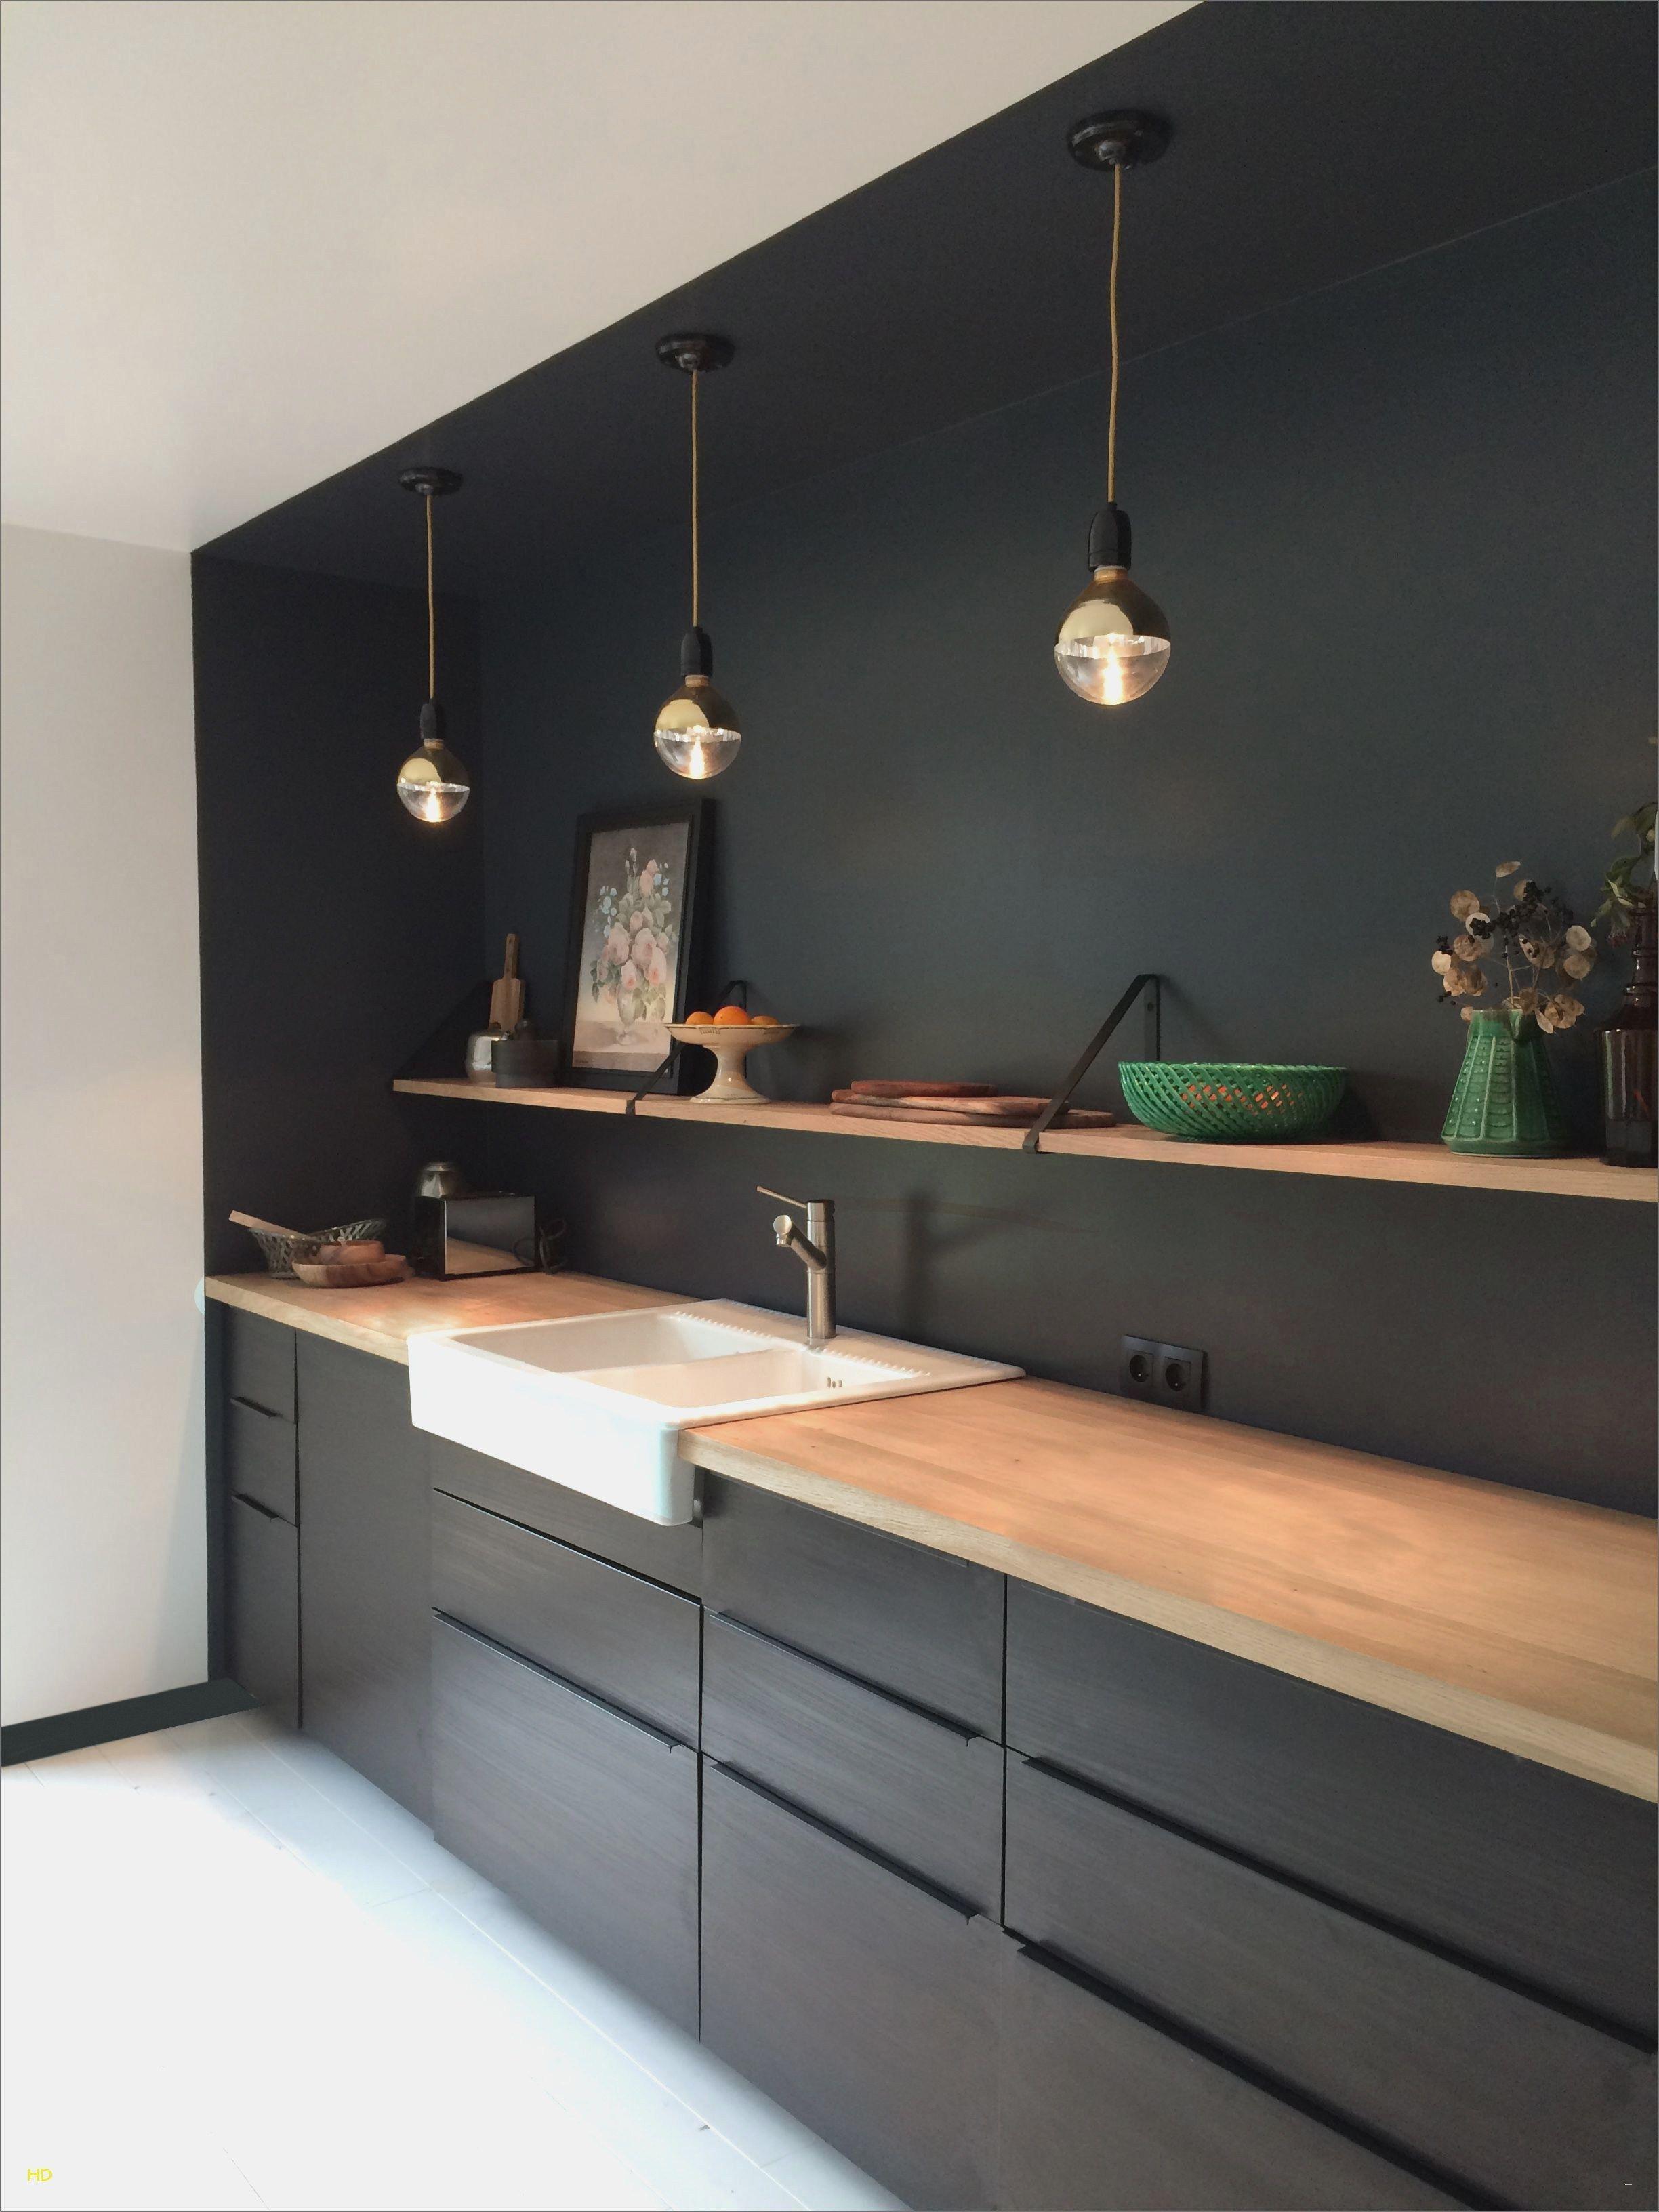 Table En Verre A Vendre Vintage Closet Of Dahlia Pictures Closet Dahlia Keukenontwerp In 2020 Ikea Kitchen Design Kitchen Cabinet Design Kitchen Interior